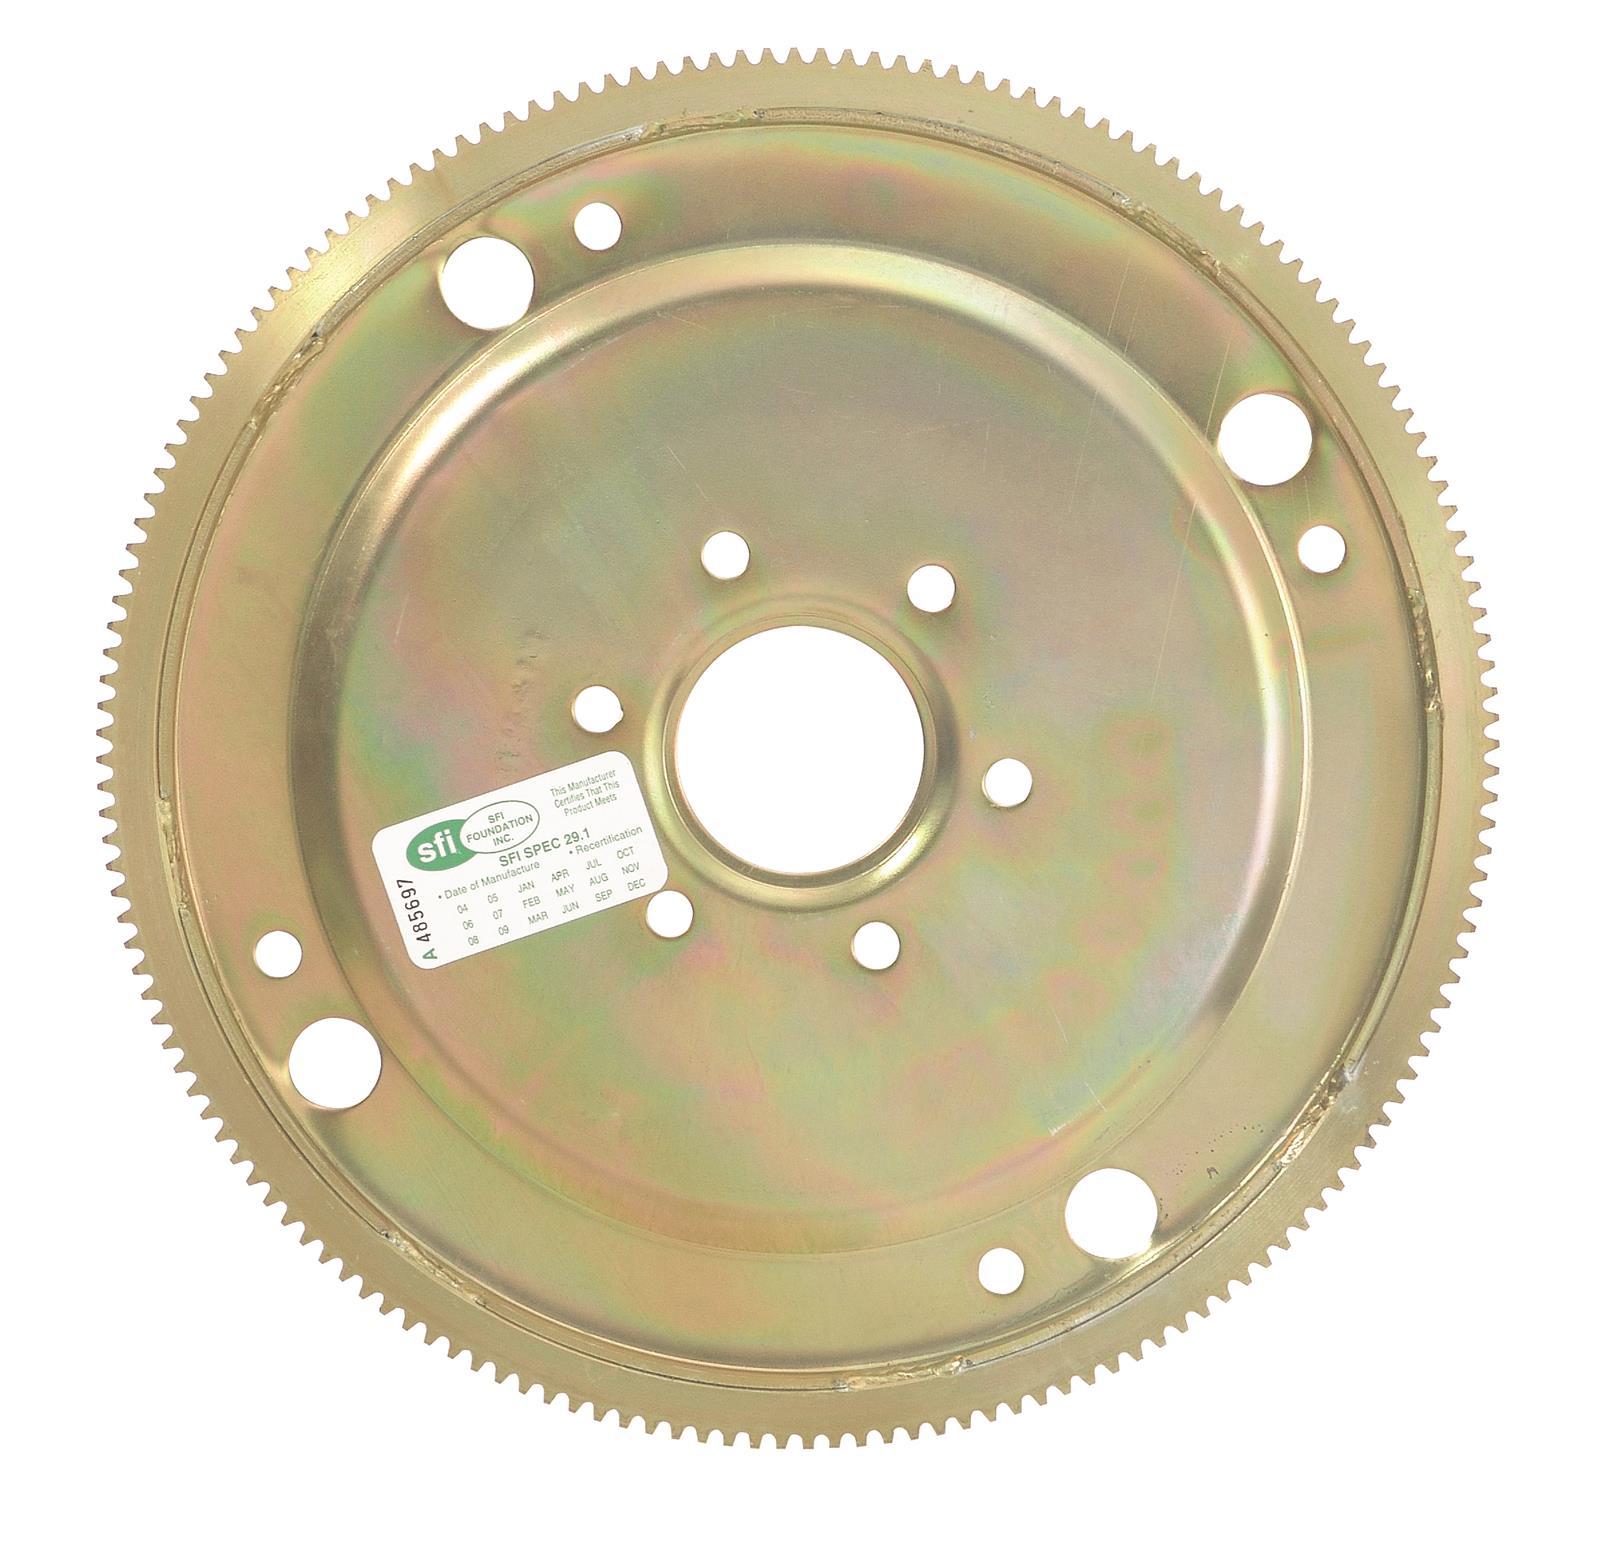 Scat Crankshafts FP-460-SFI Flexplate for Big Block Ford